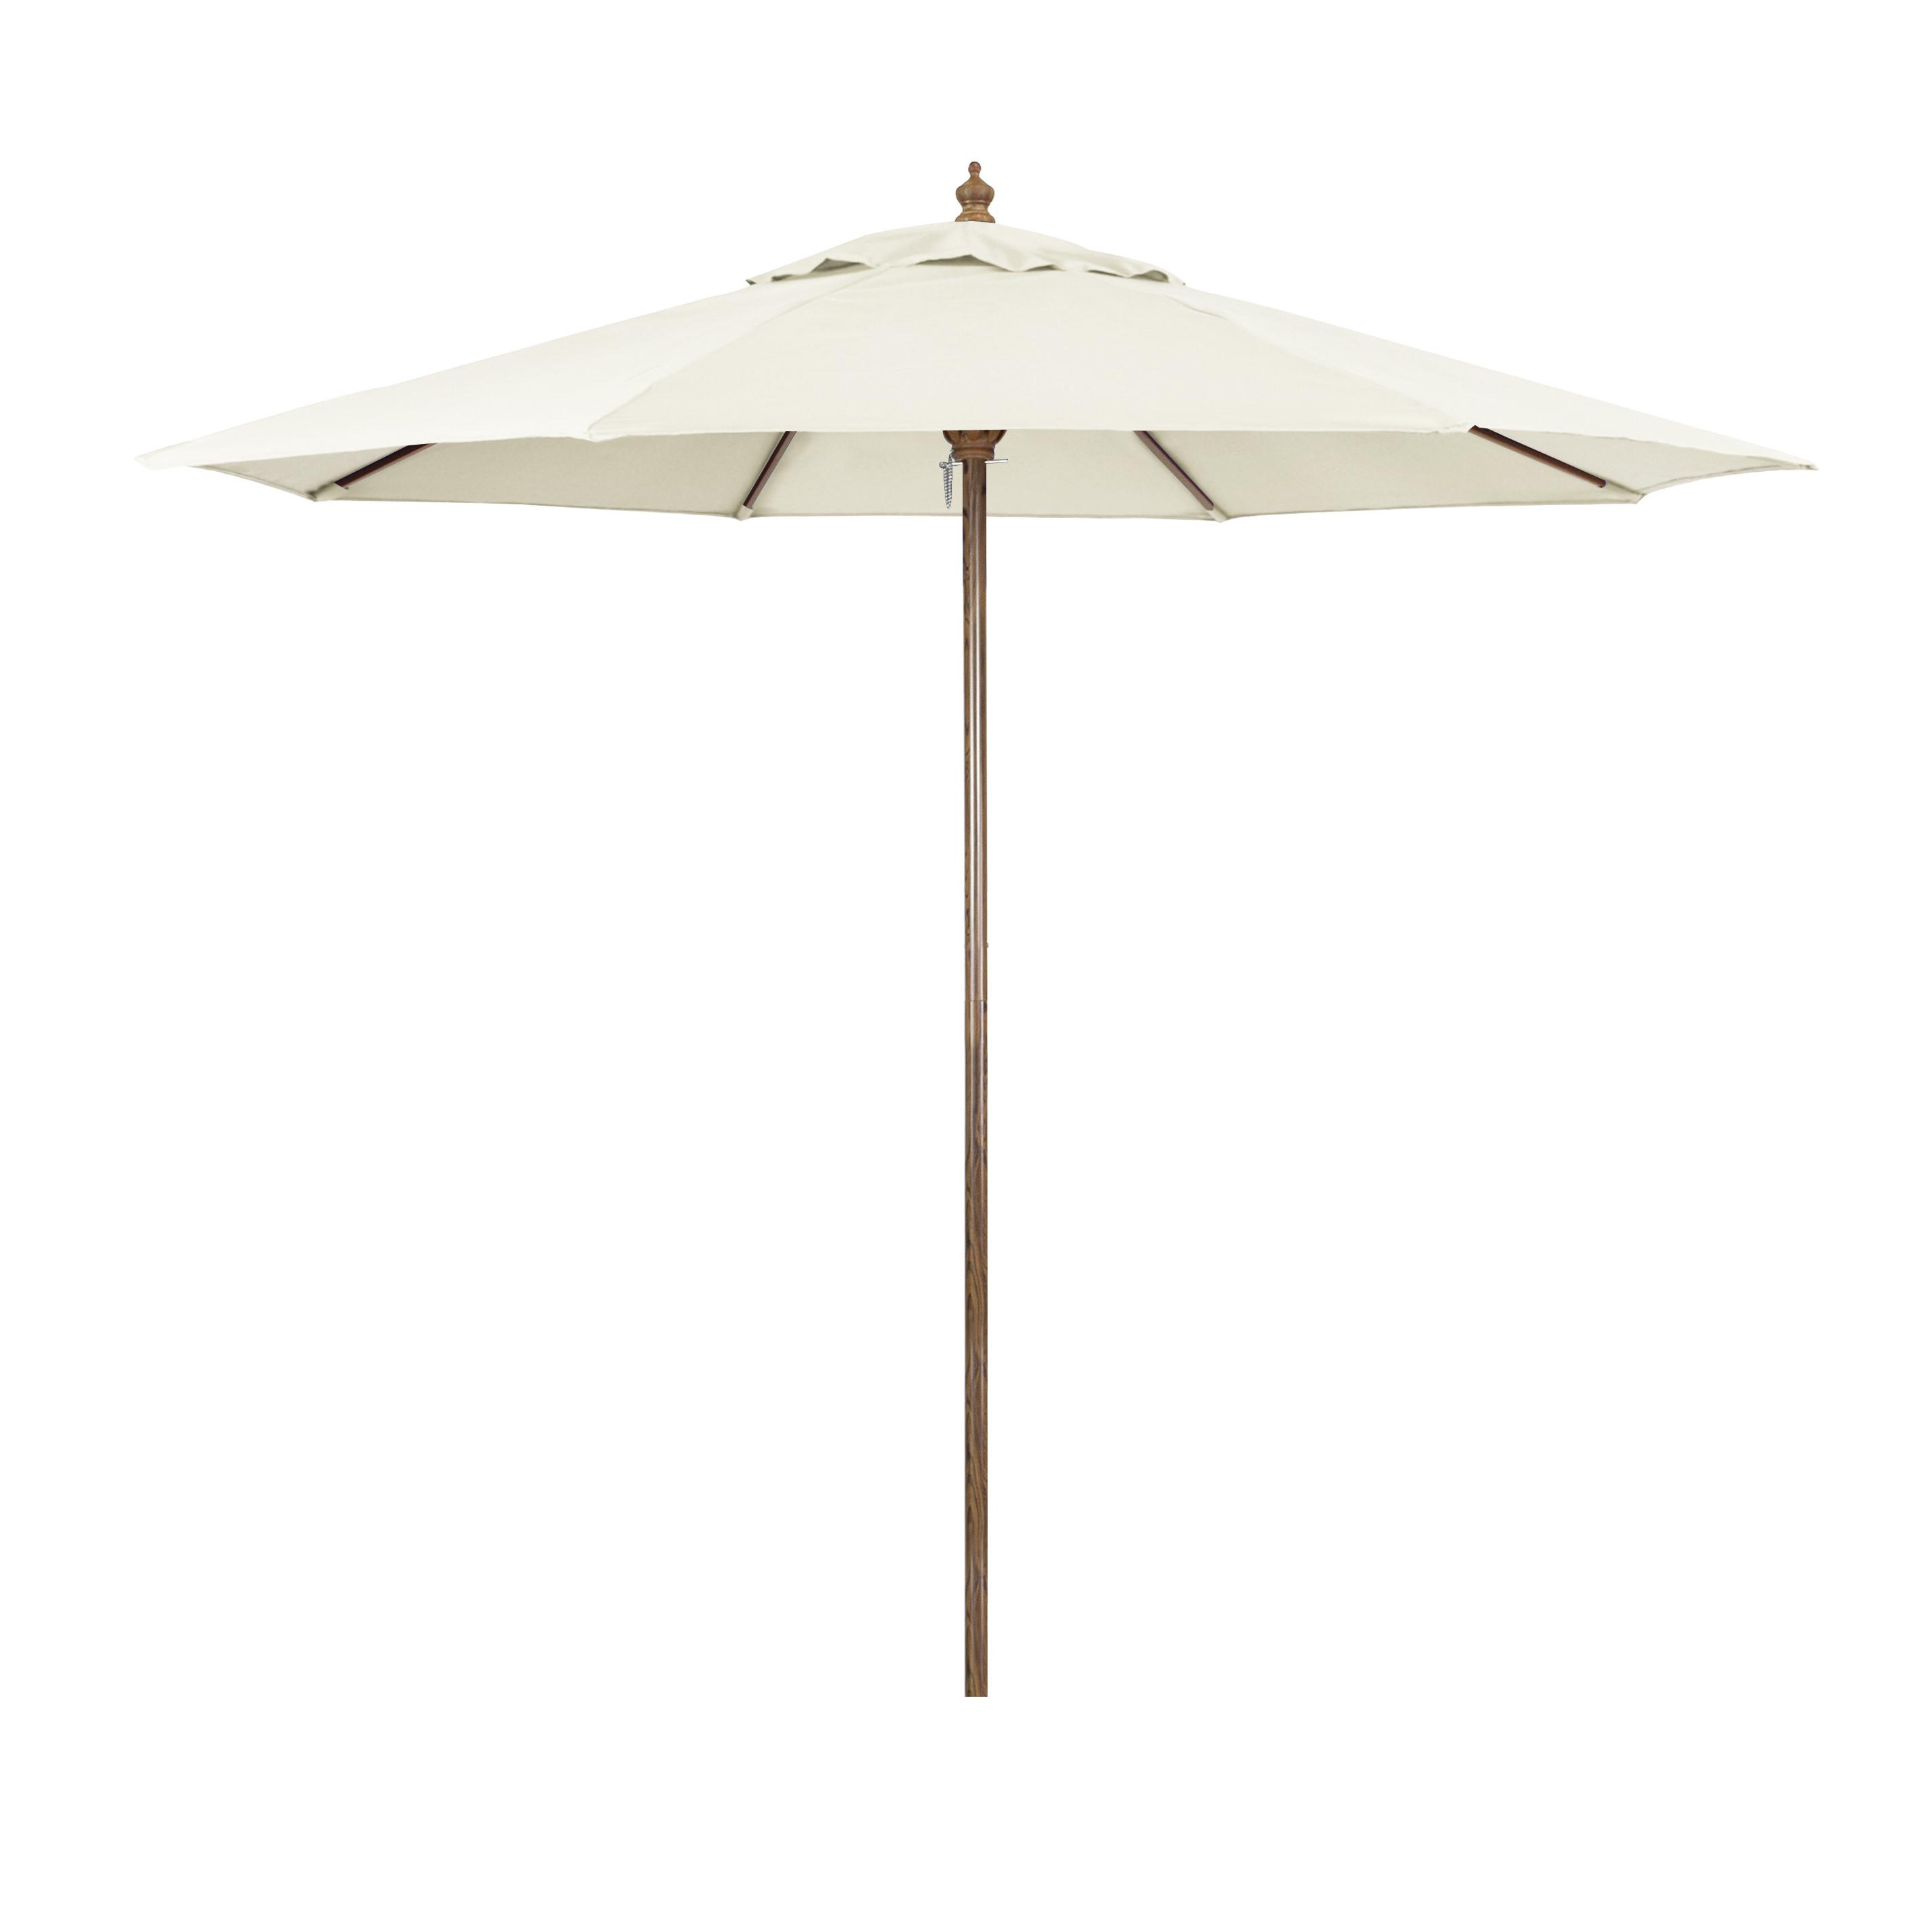 Jericho Market Umbrellas For Current Ryant 9' Market Umbrella (View 5 of 20)